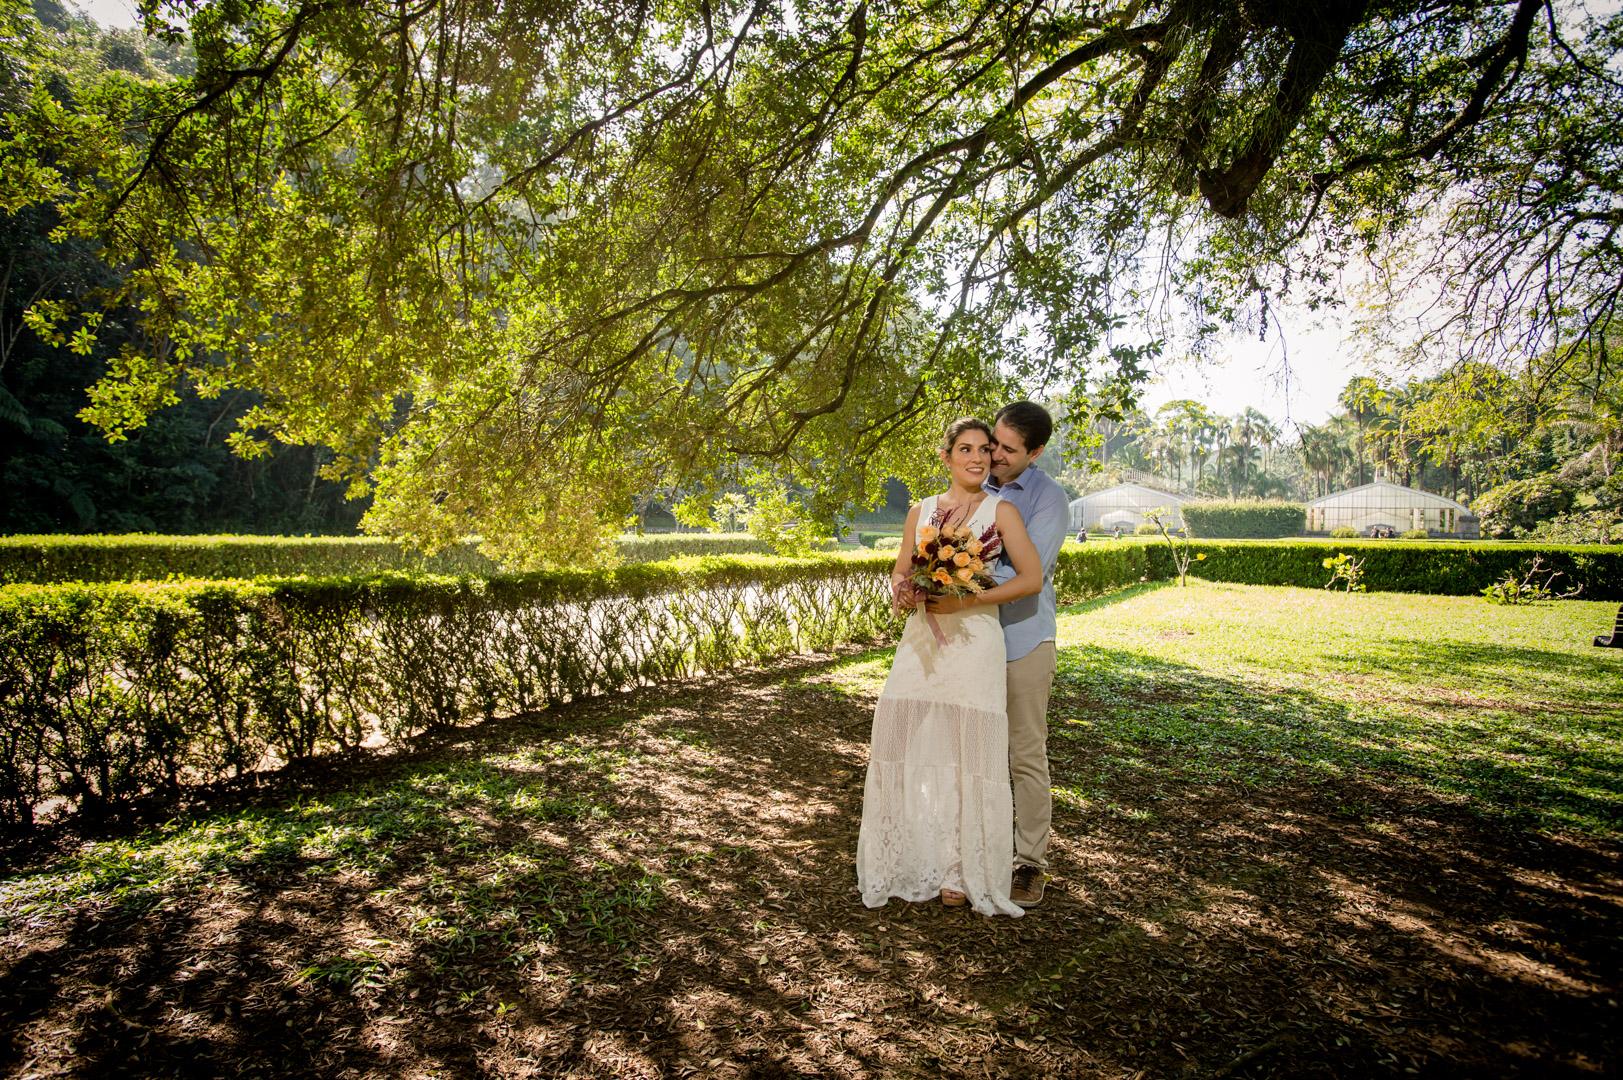 Jardim Botanico Pre Wedding 2